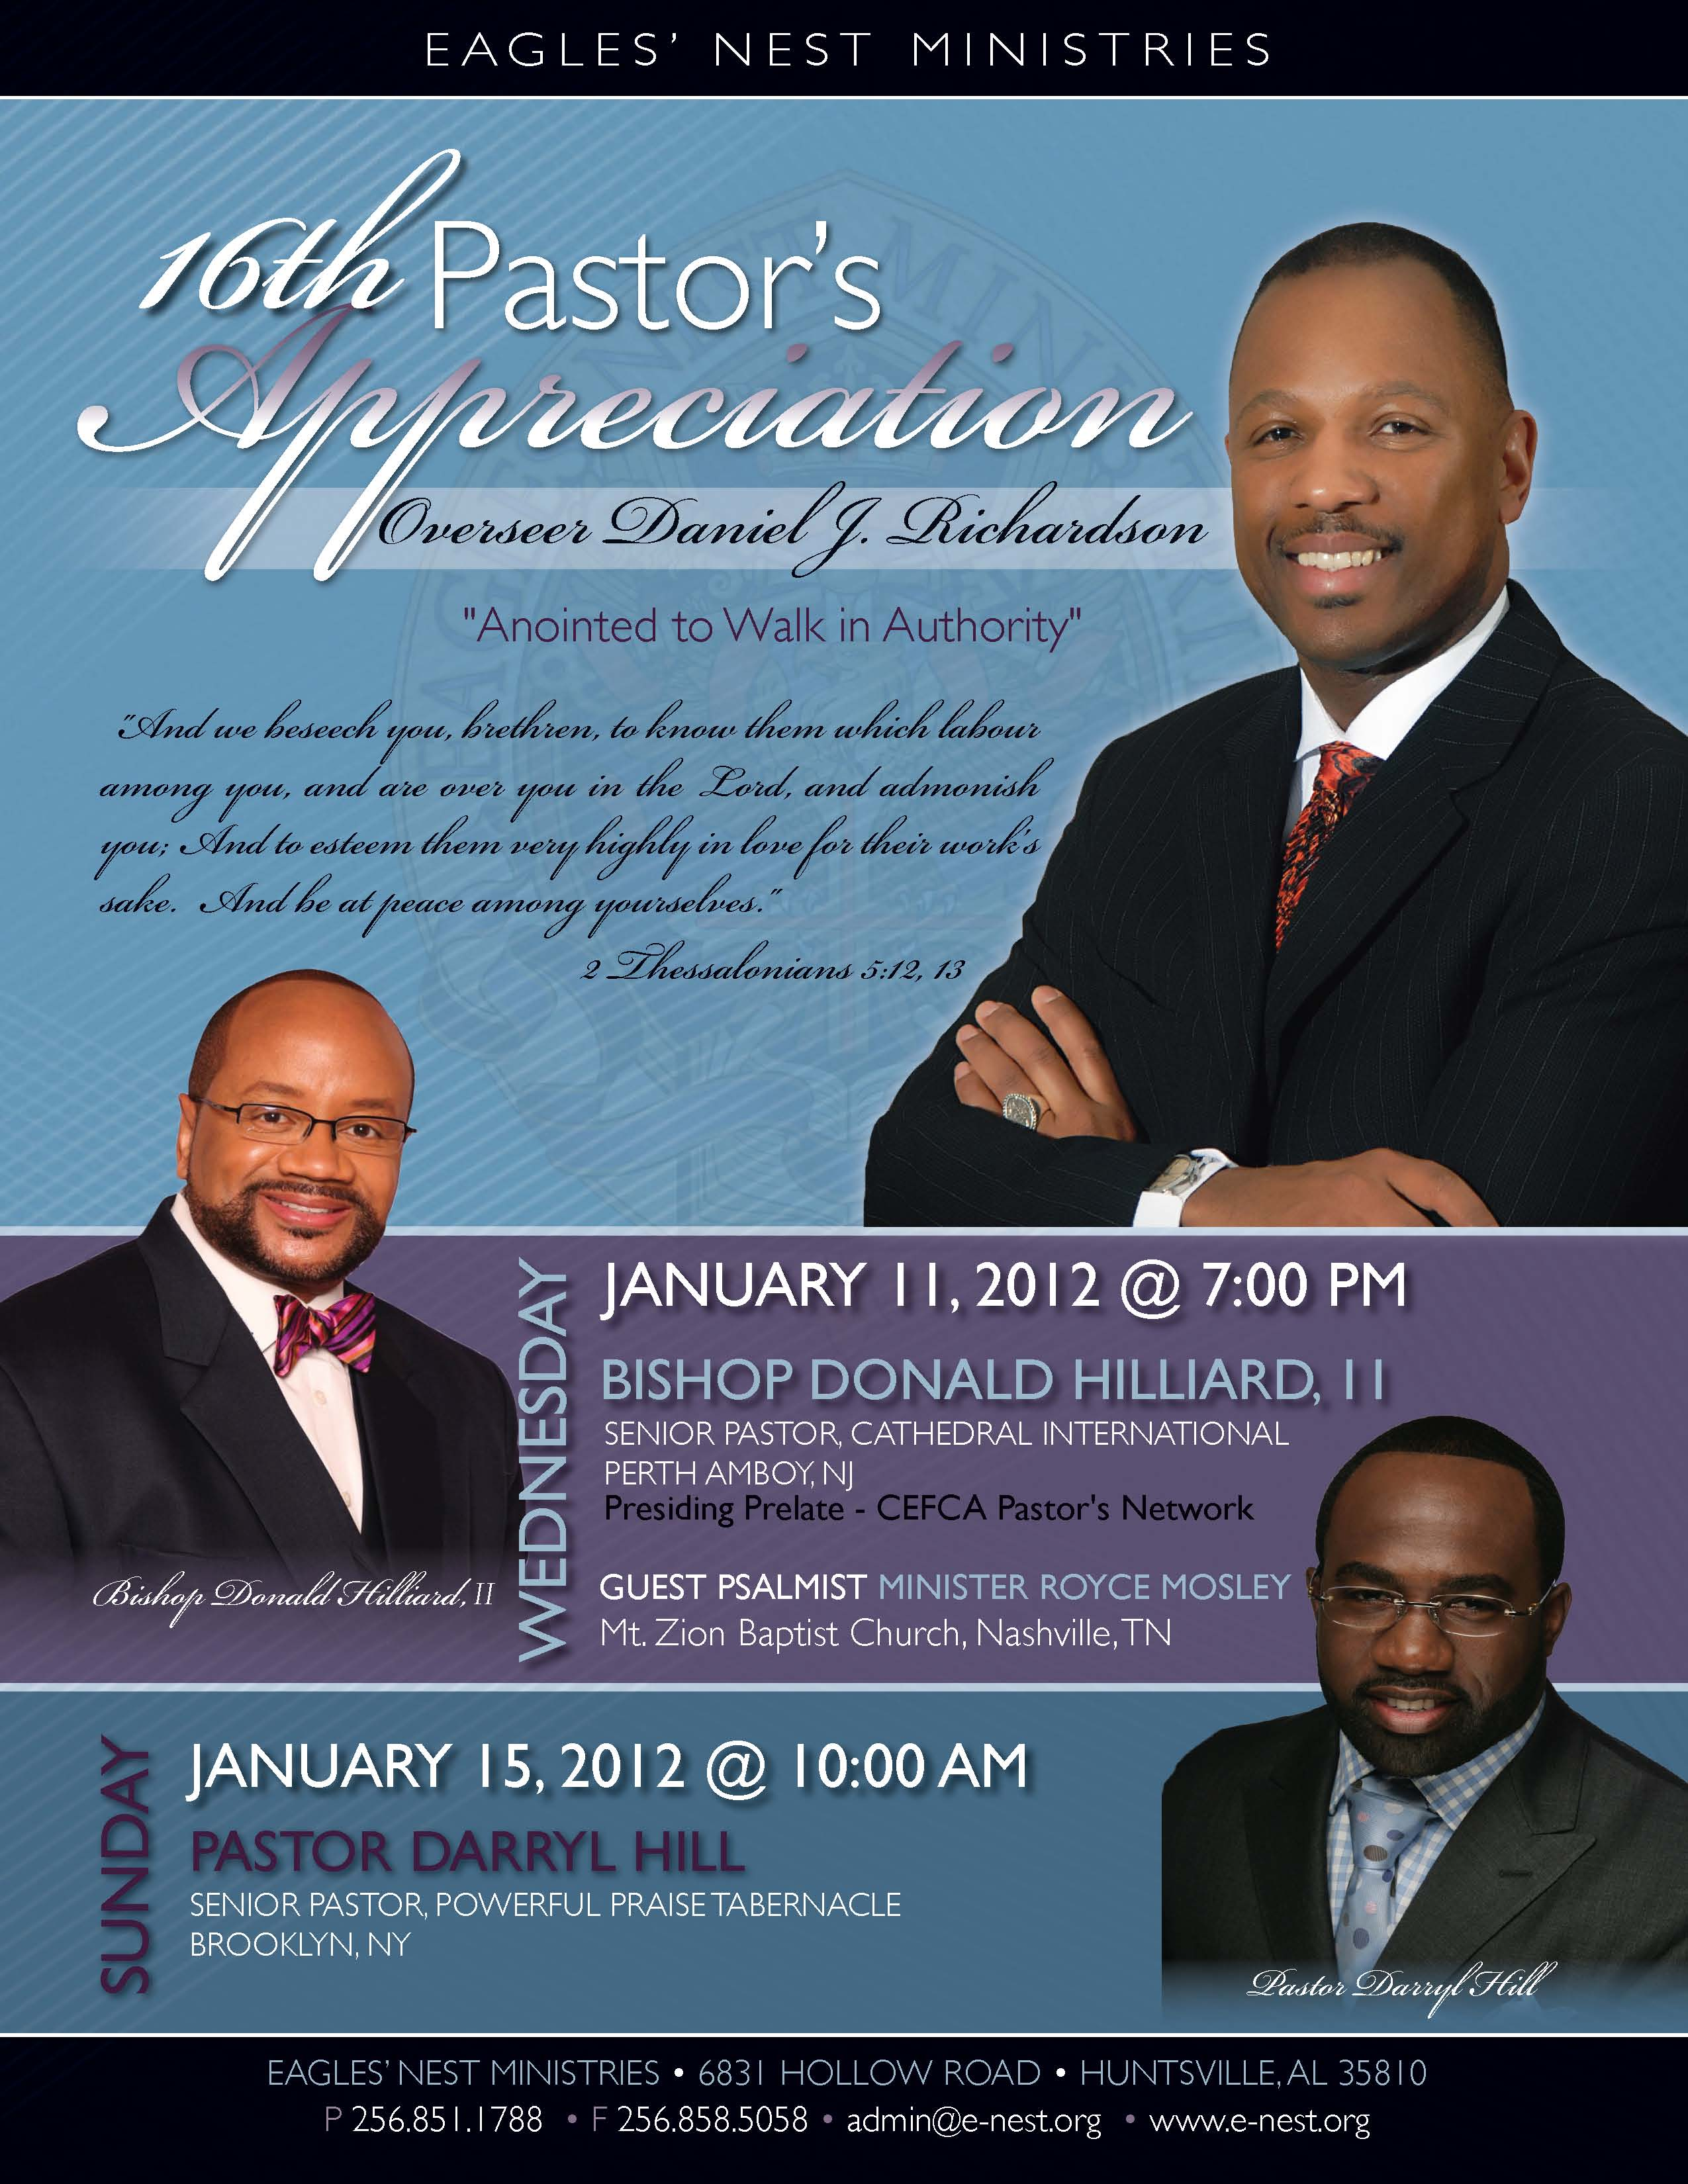 6 pastor anniversary flyer design images